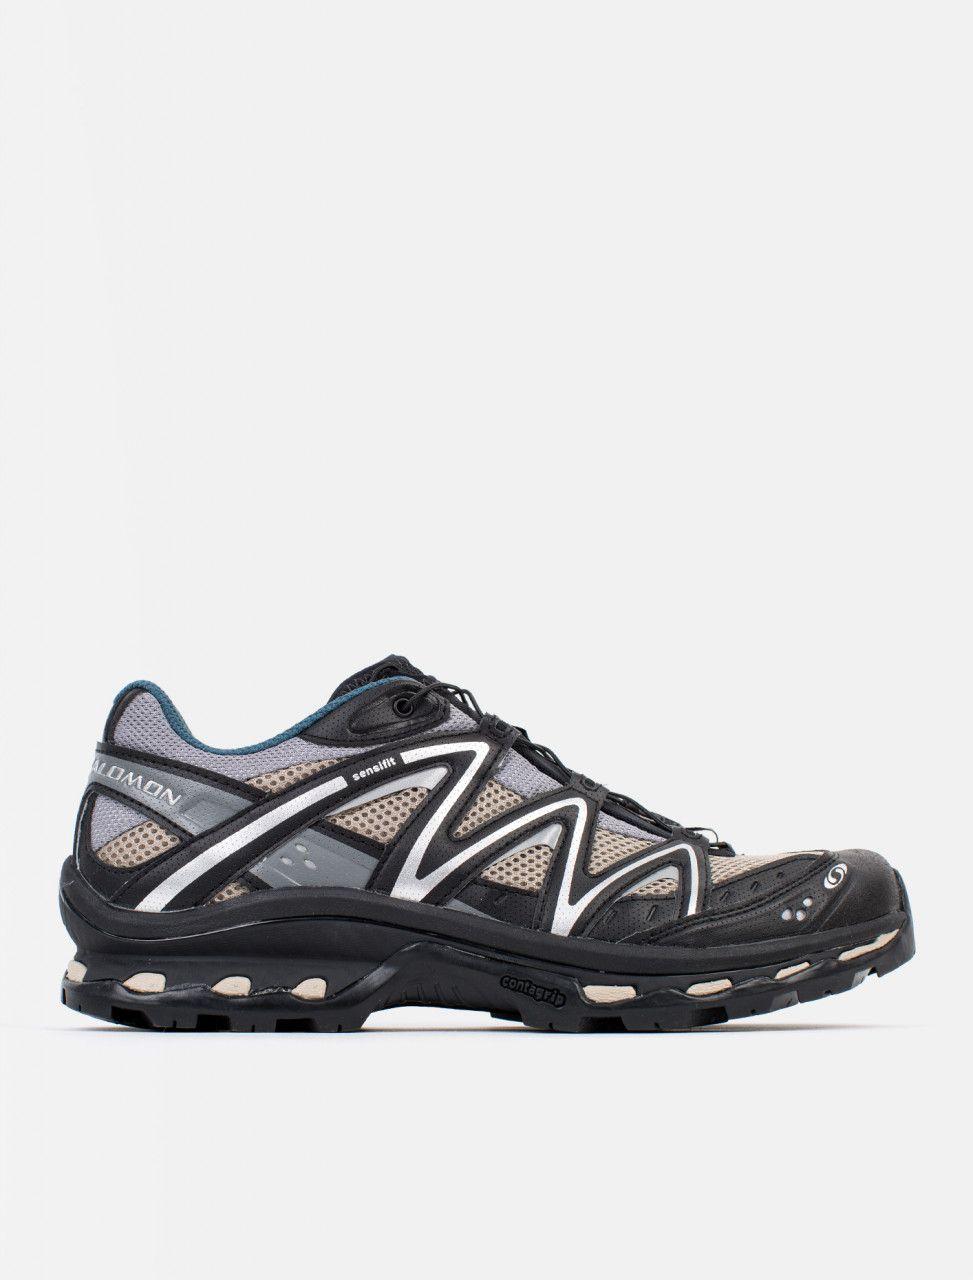 super popular 86d2d 60791 Salomon XT-QUEST ADV Sneaker   Voo Store Berlin   Worldwide Shipping